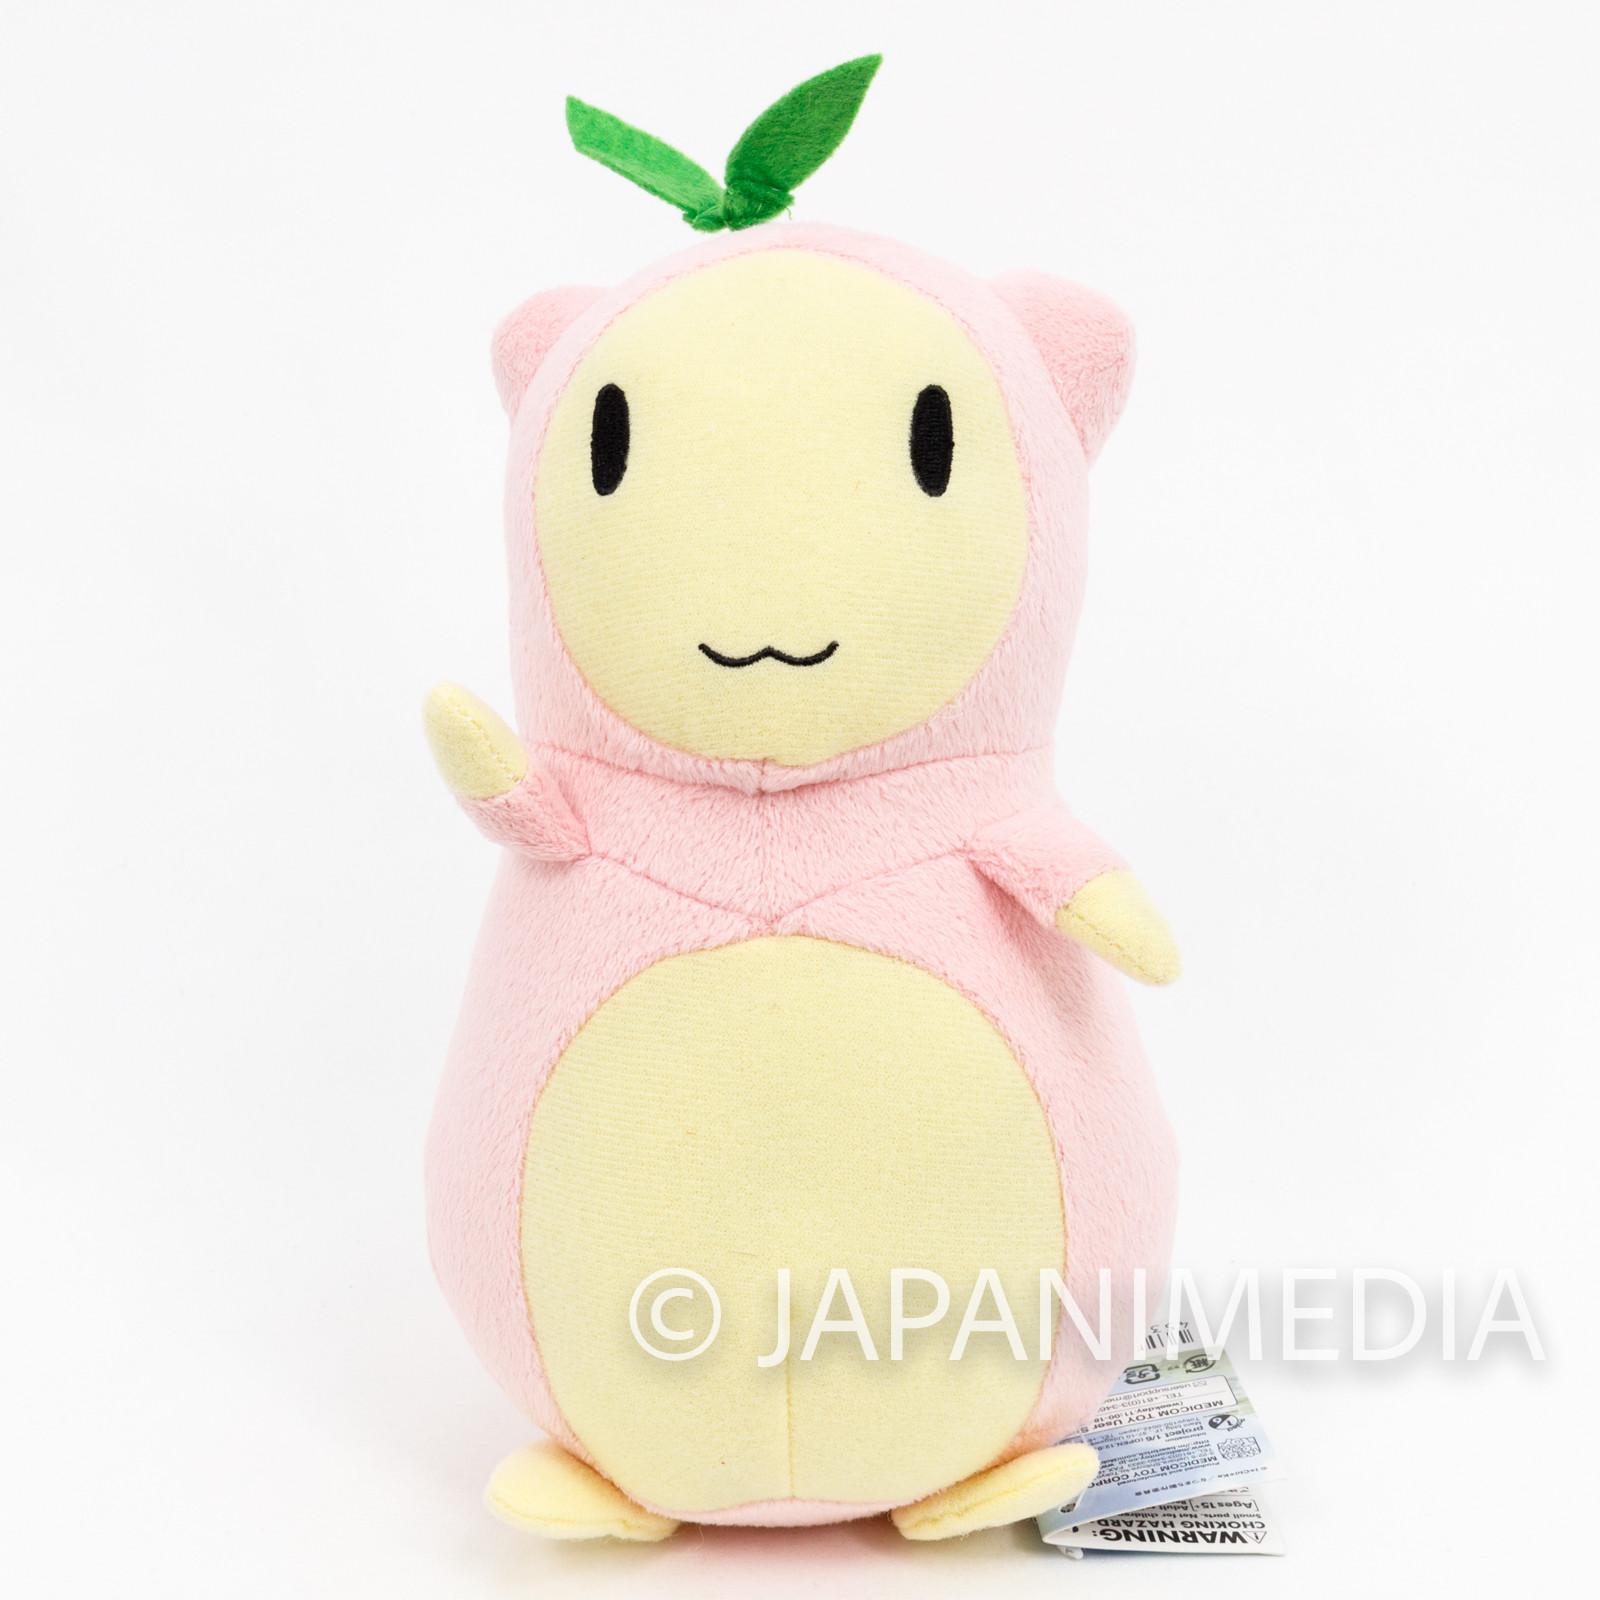 Waiting In The Summer Ano Natsu de Matteru RINON Plush Doll Medicom Toy JAPAN